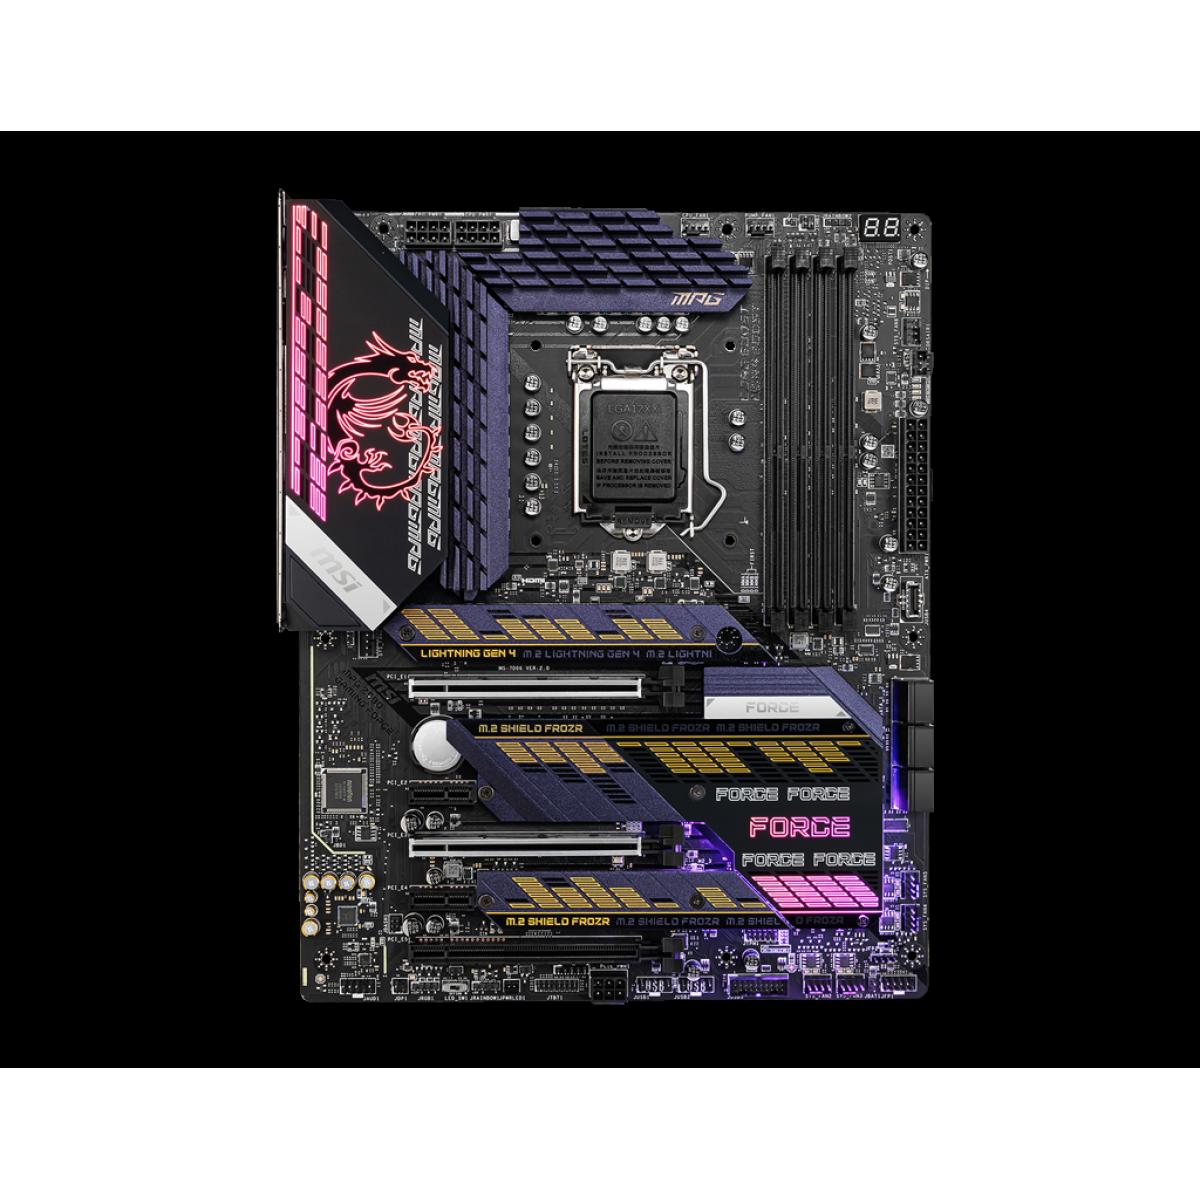 Placa Mãe MSI MPG Z590 GAMING FORCE, Chipset Intel Z590, Socket 1200, ATX, DDR4